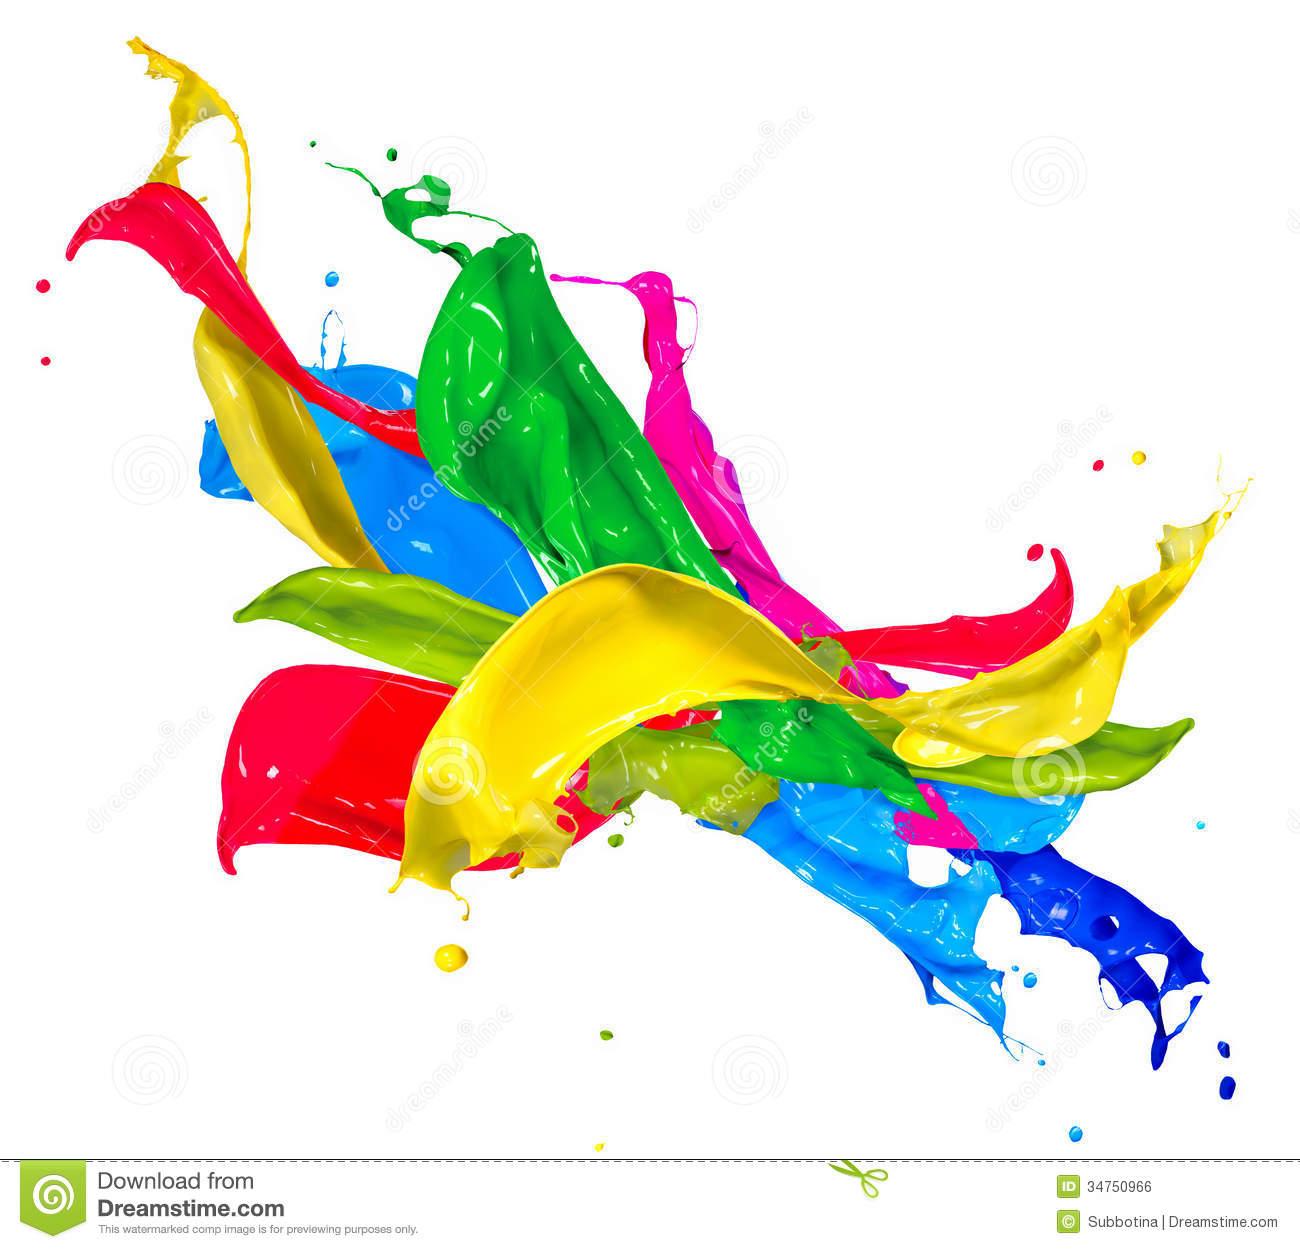 Colorful Paint Splashes Royalty Free Stock Image.